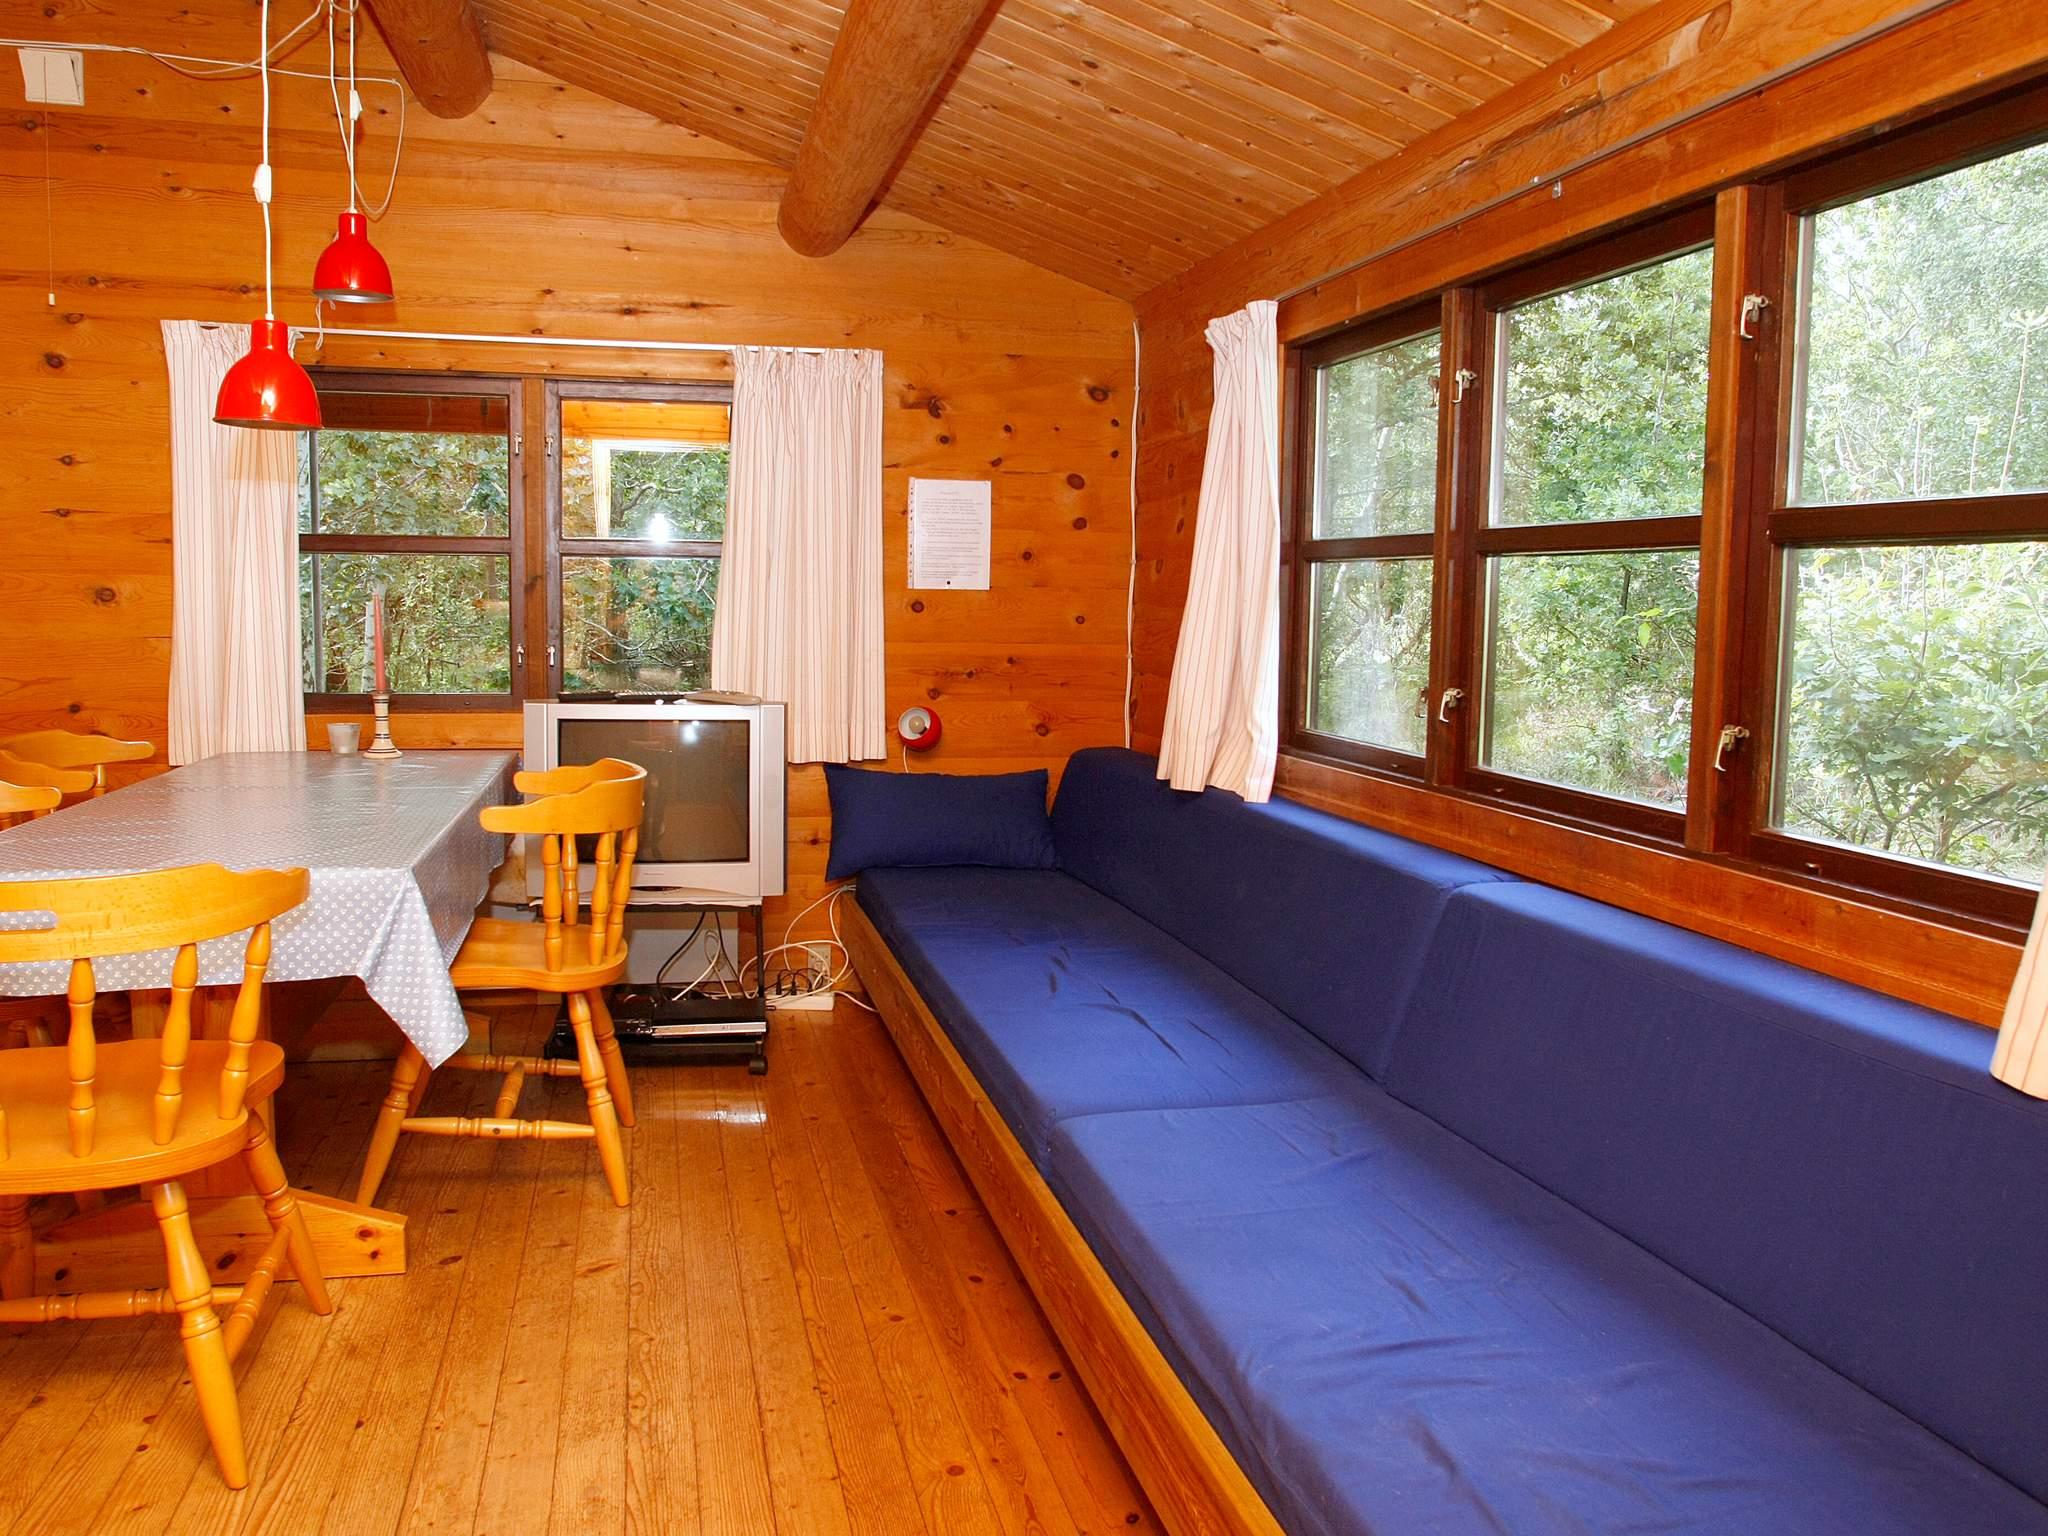 Ferienhaus Læsø/Vesterø (88190), Læsø, , Læsø, Dänemark, Bild 10